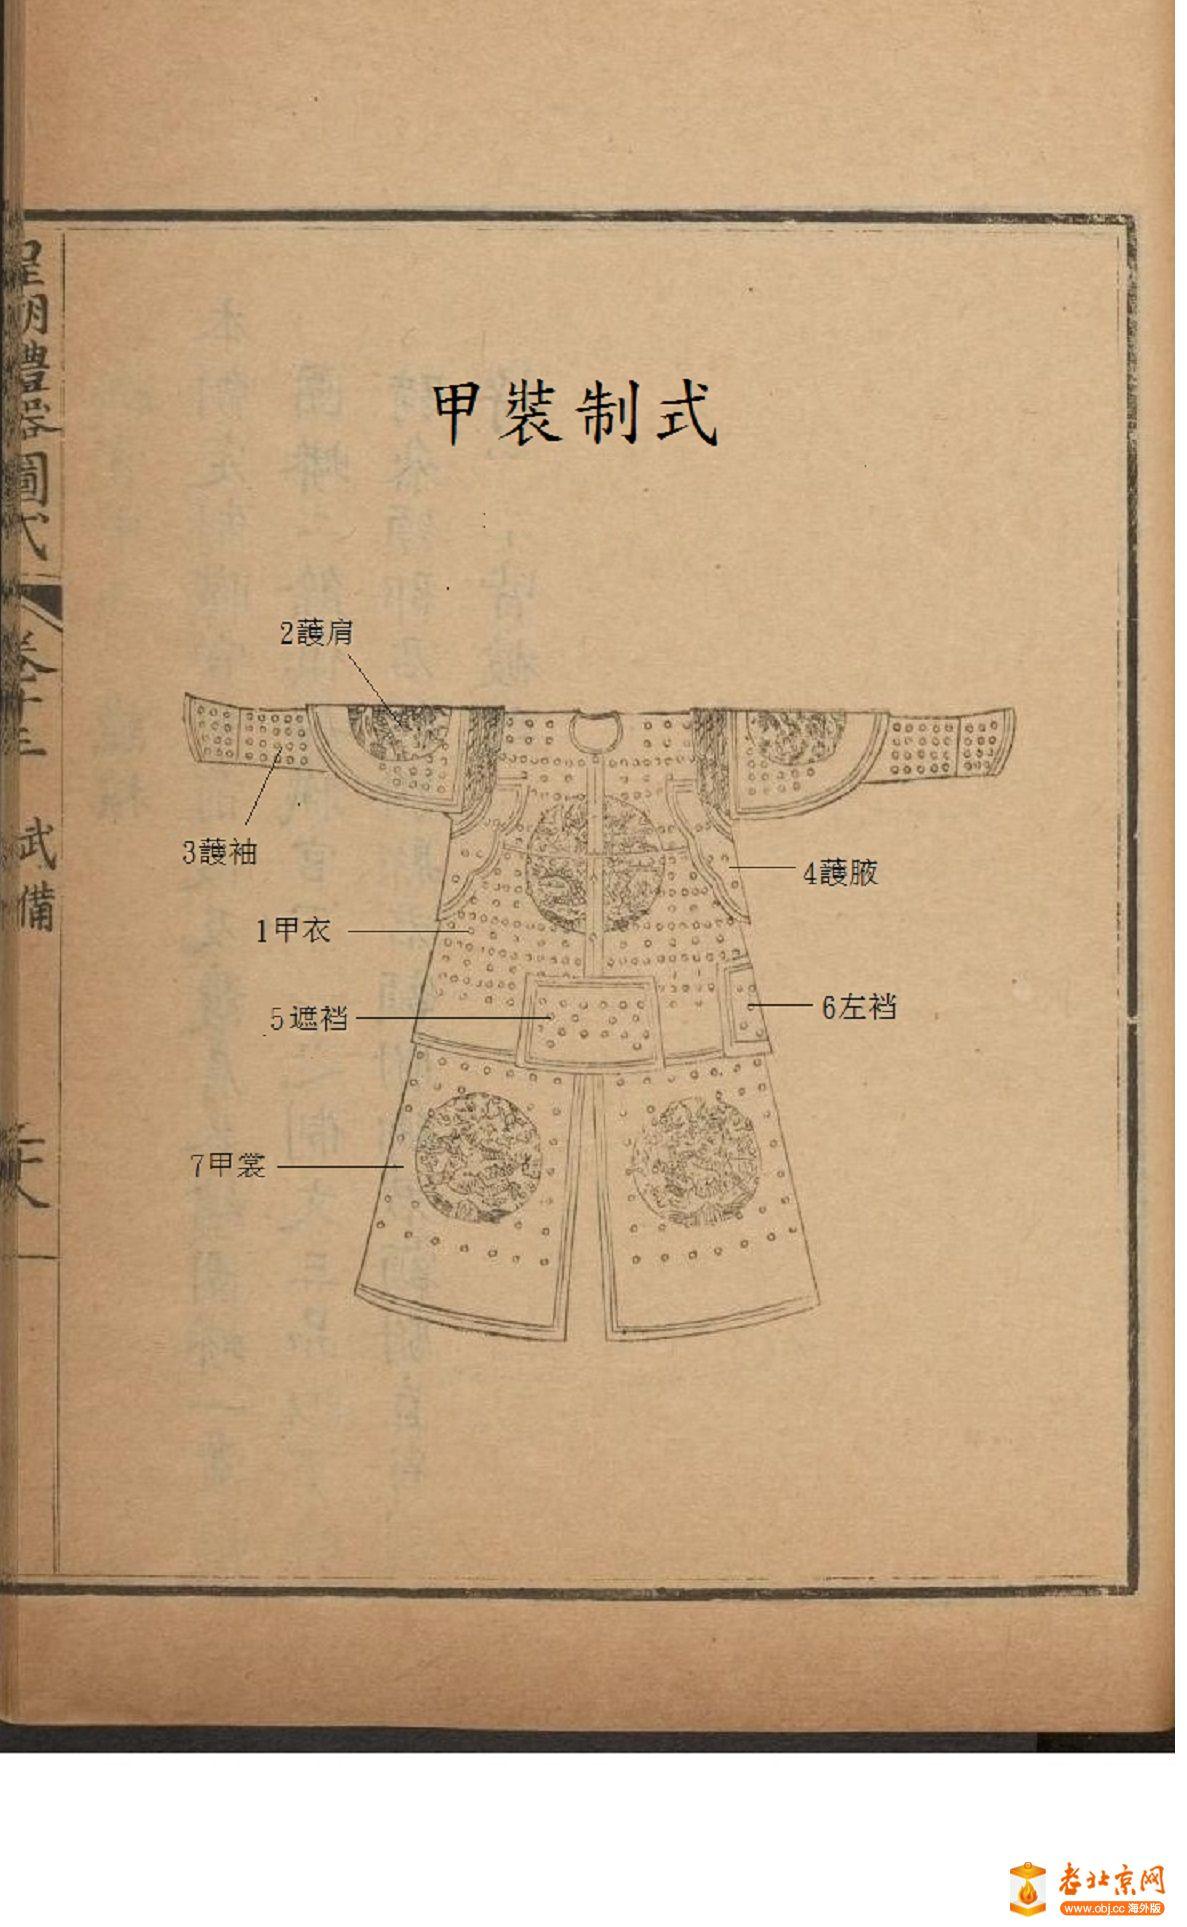 皇朝礼器图式1301-1350.頁_page30_image1.jpg